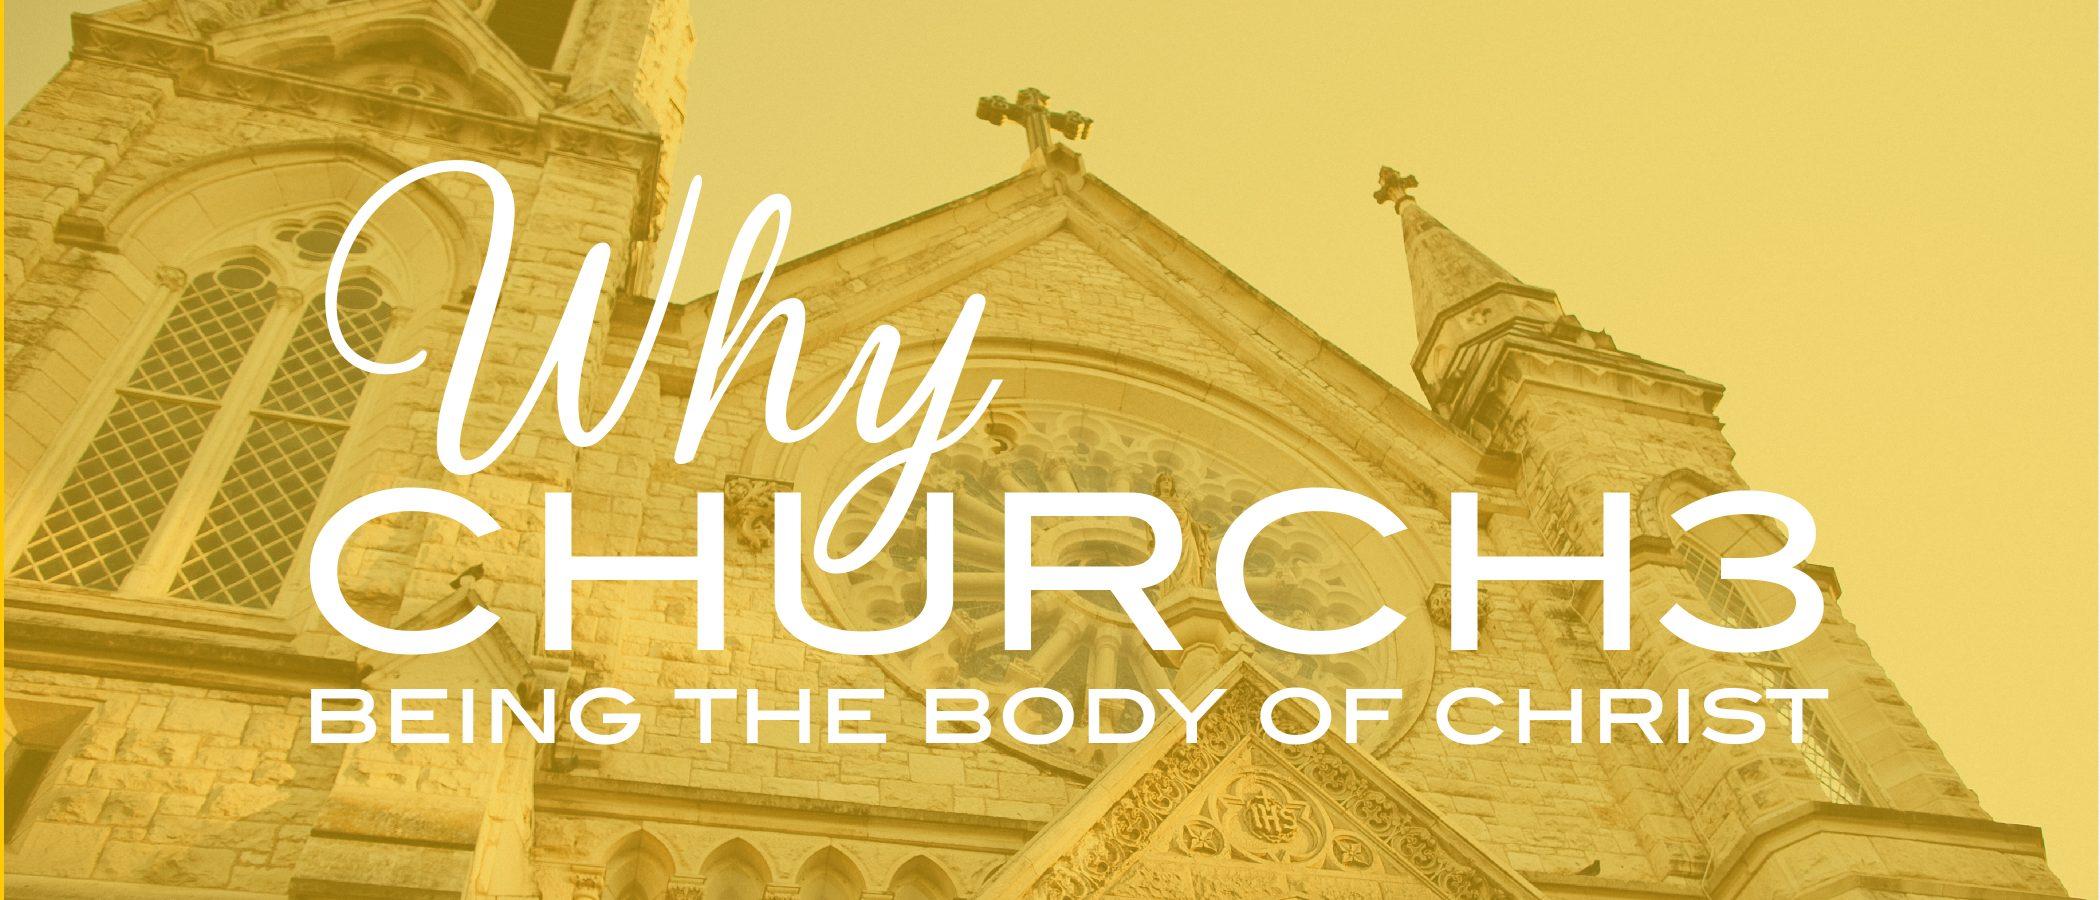 why-church-series-dq11brd-dq2021_why-church3-being-the-body-of-christ2x-100